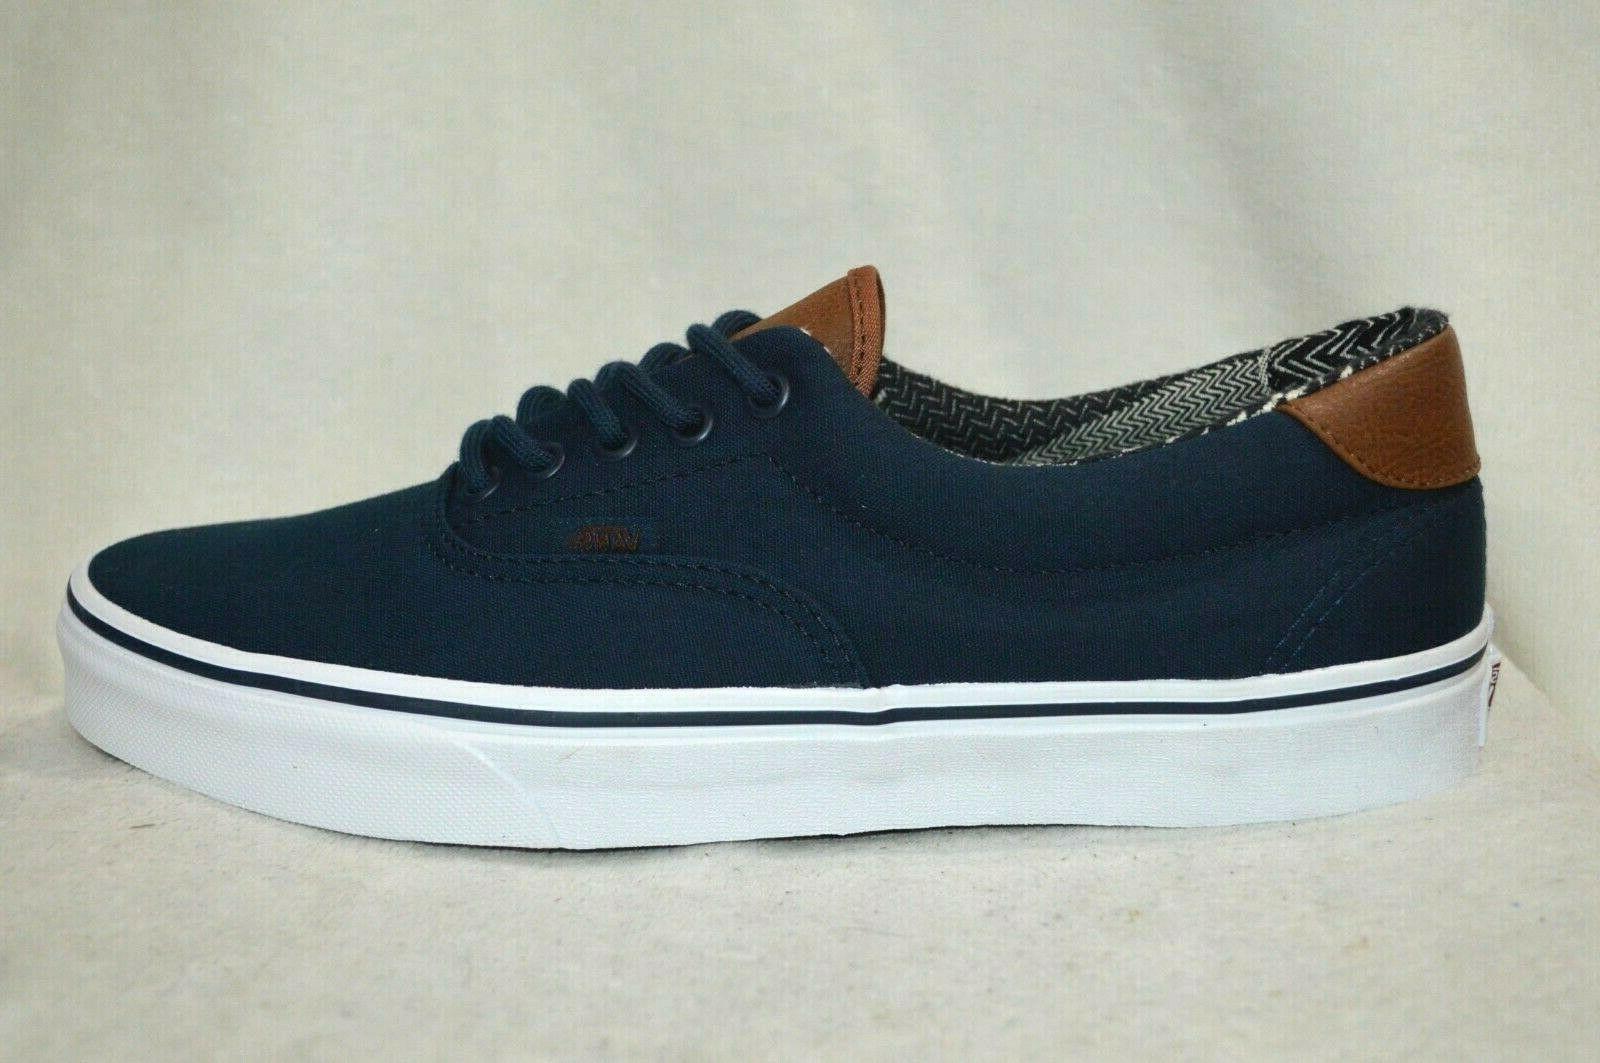 Vans Men's C&L 59 Blue Mix Skate